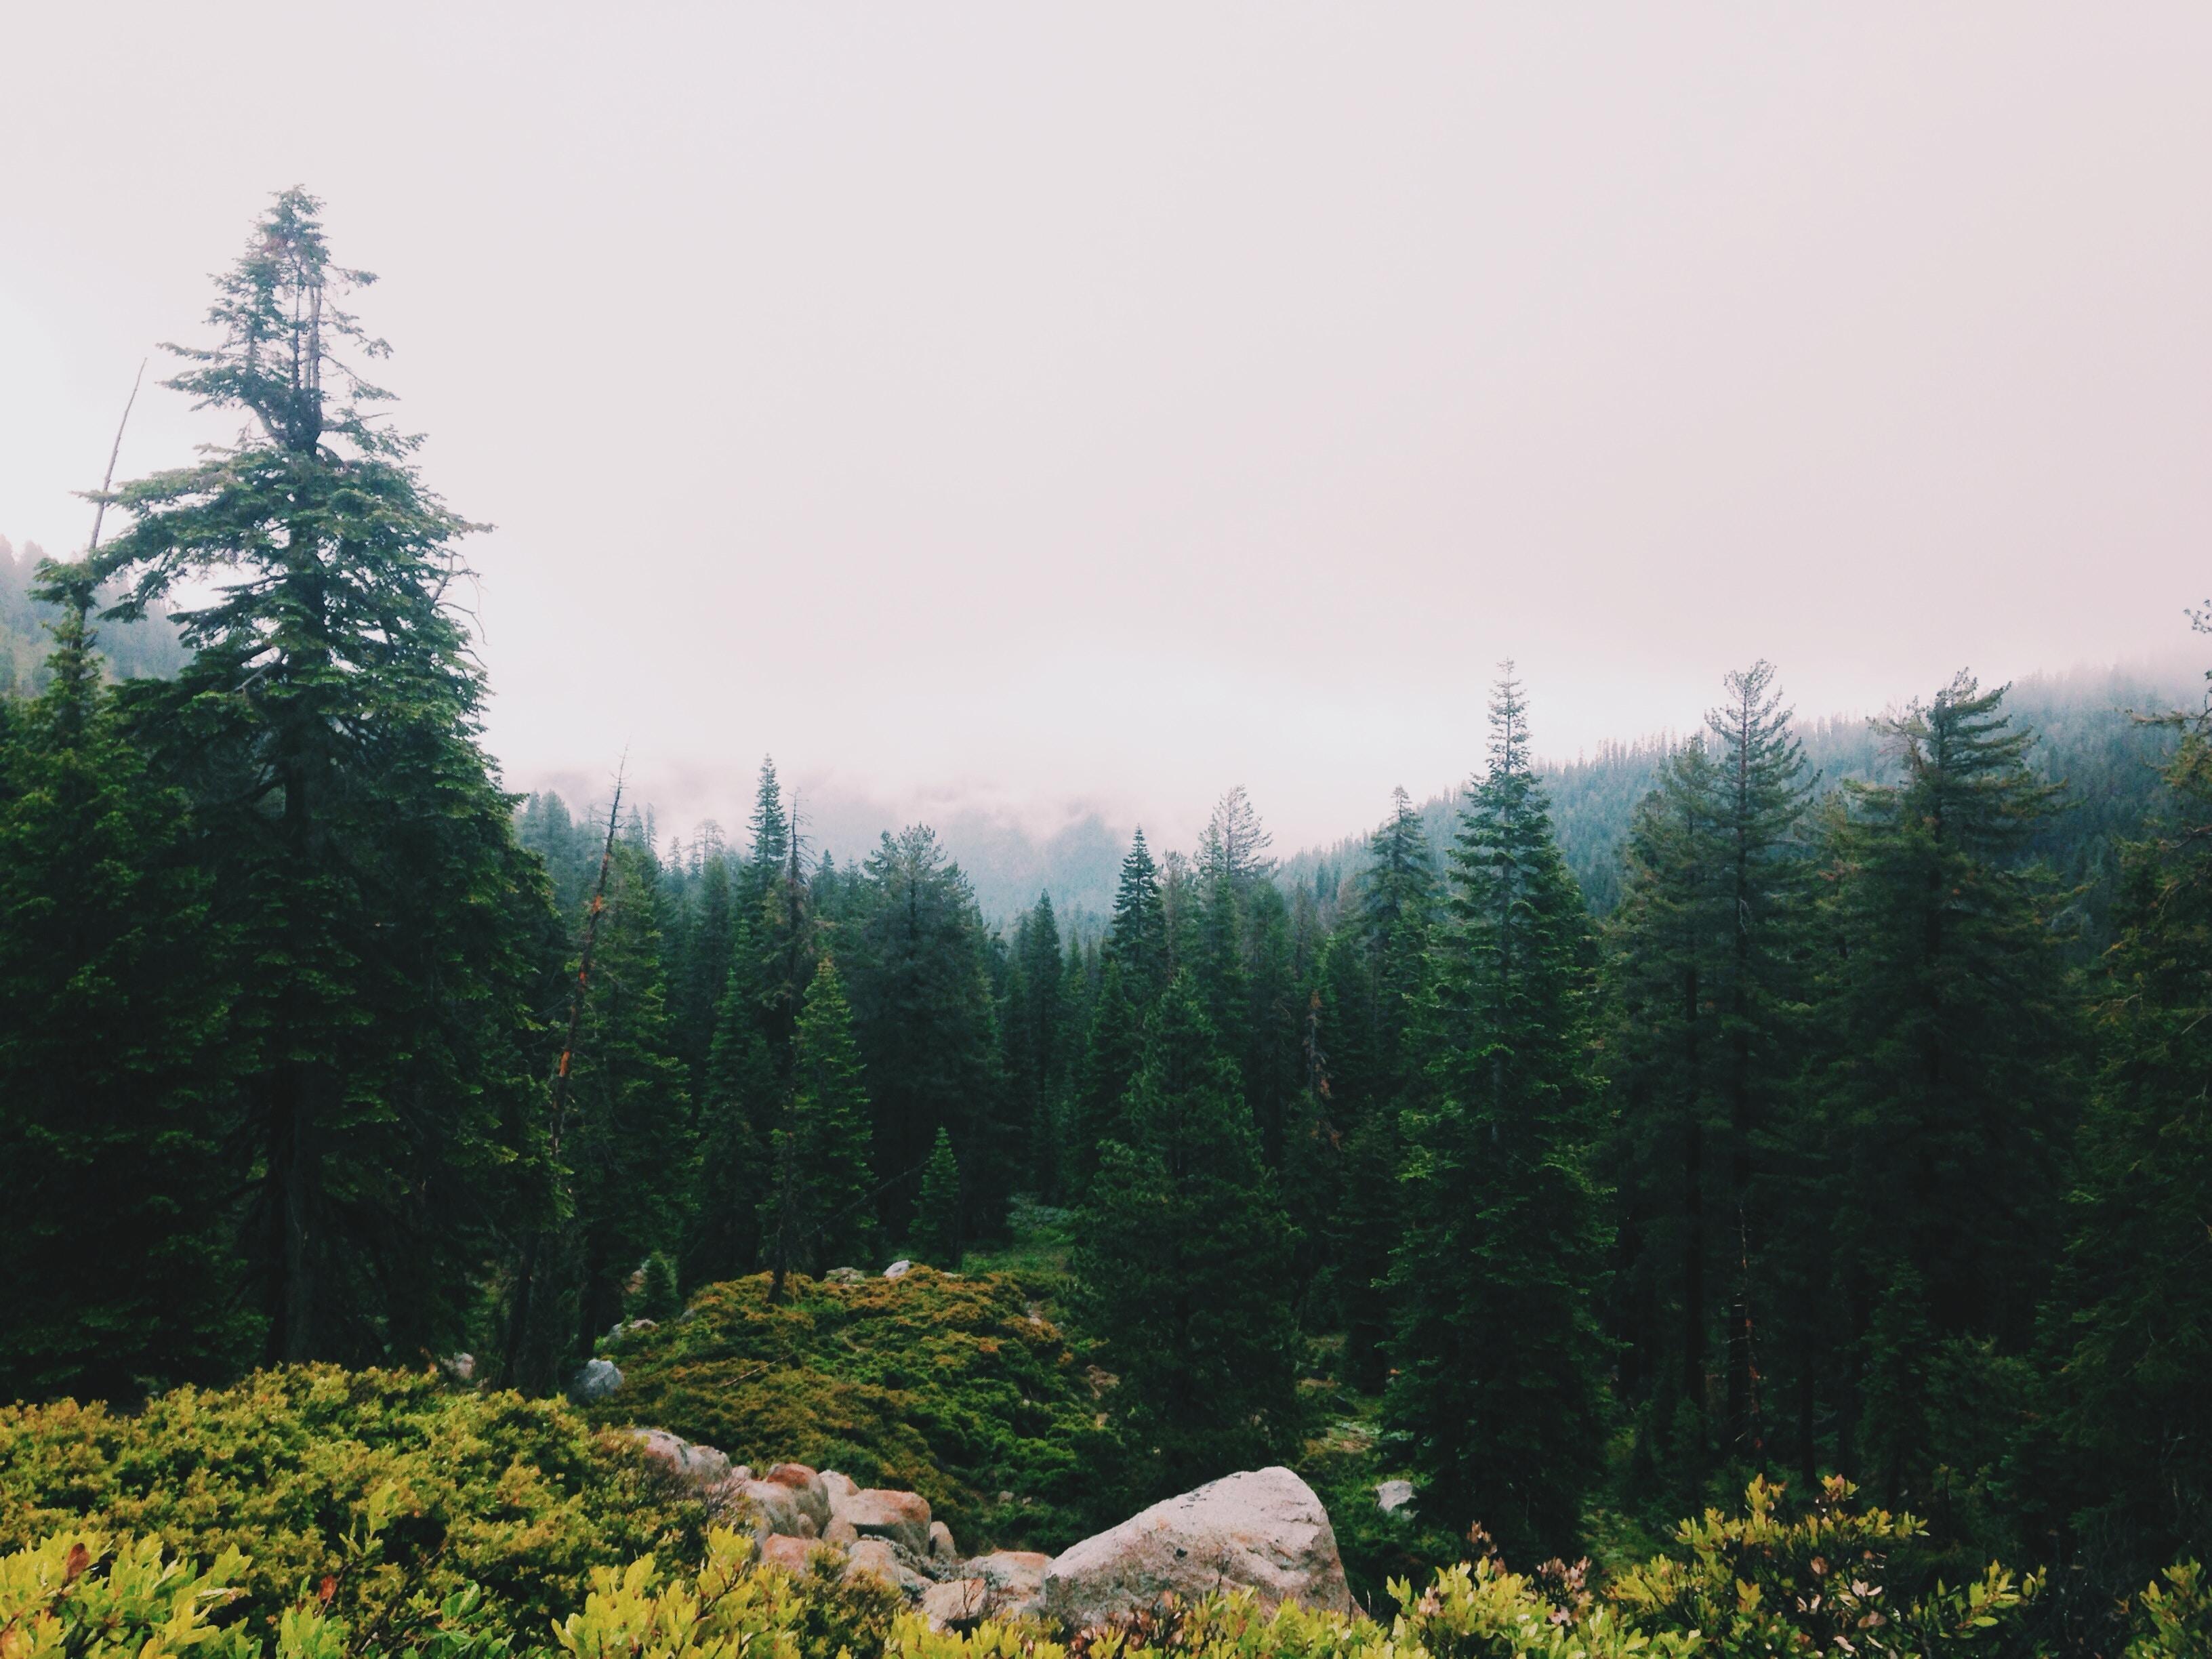 photo of pine trees near flowers